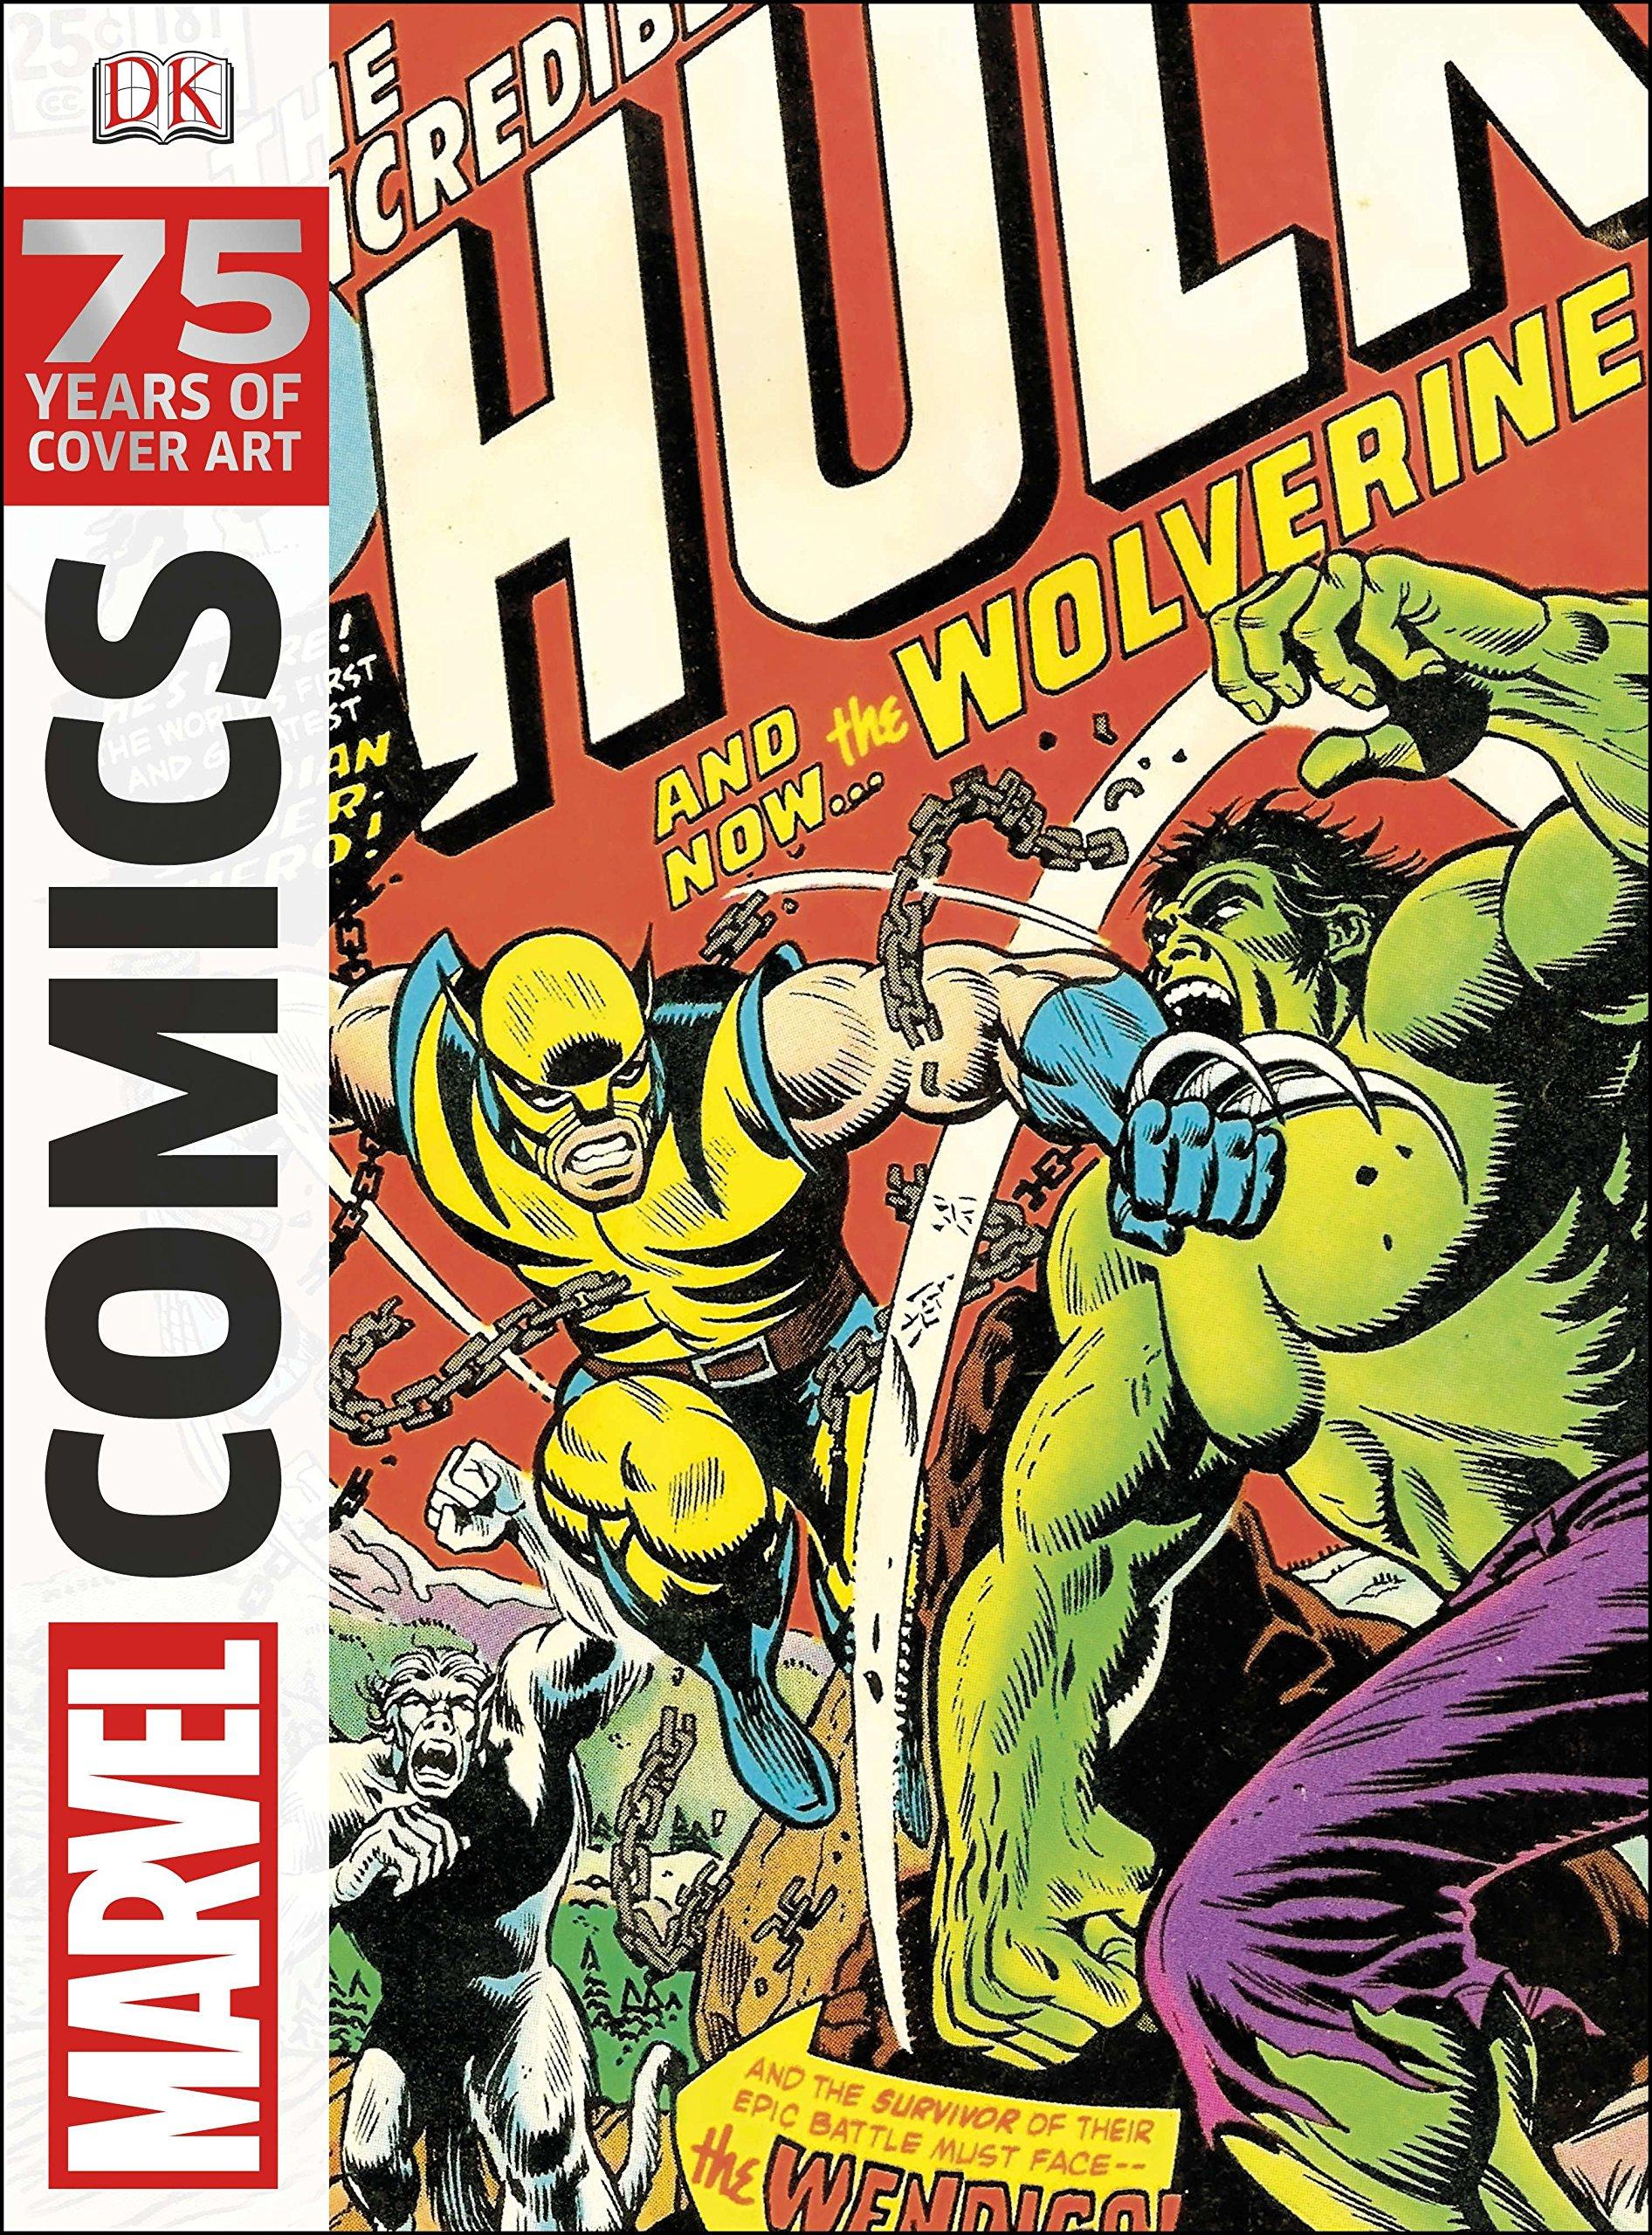 5a393fd3f8f Amazon.com: Marvel Comics: 75 Years of Cover Art (9781465420404): DK ...